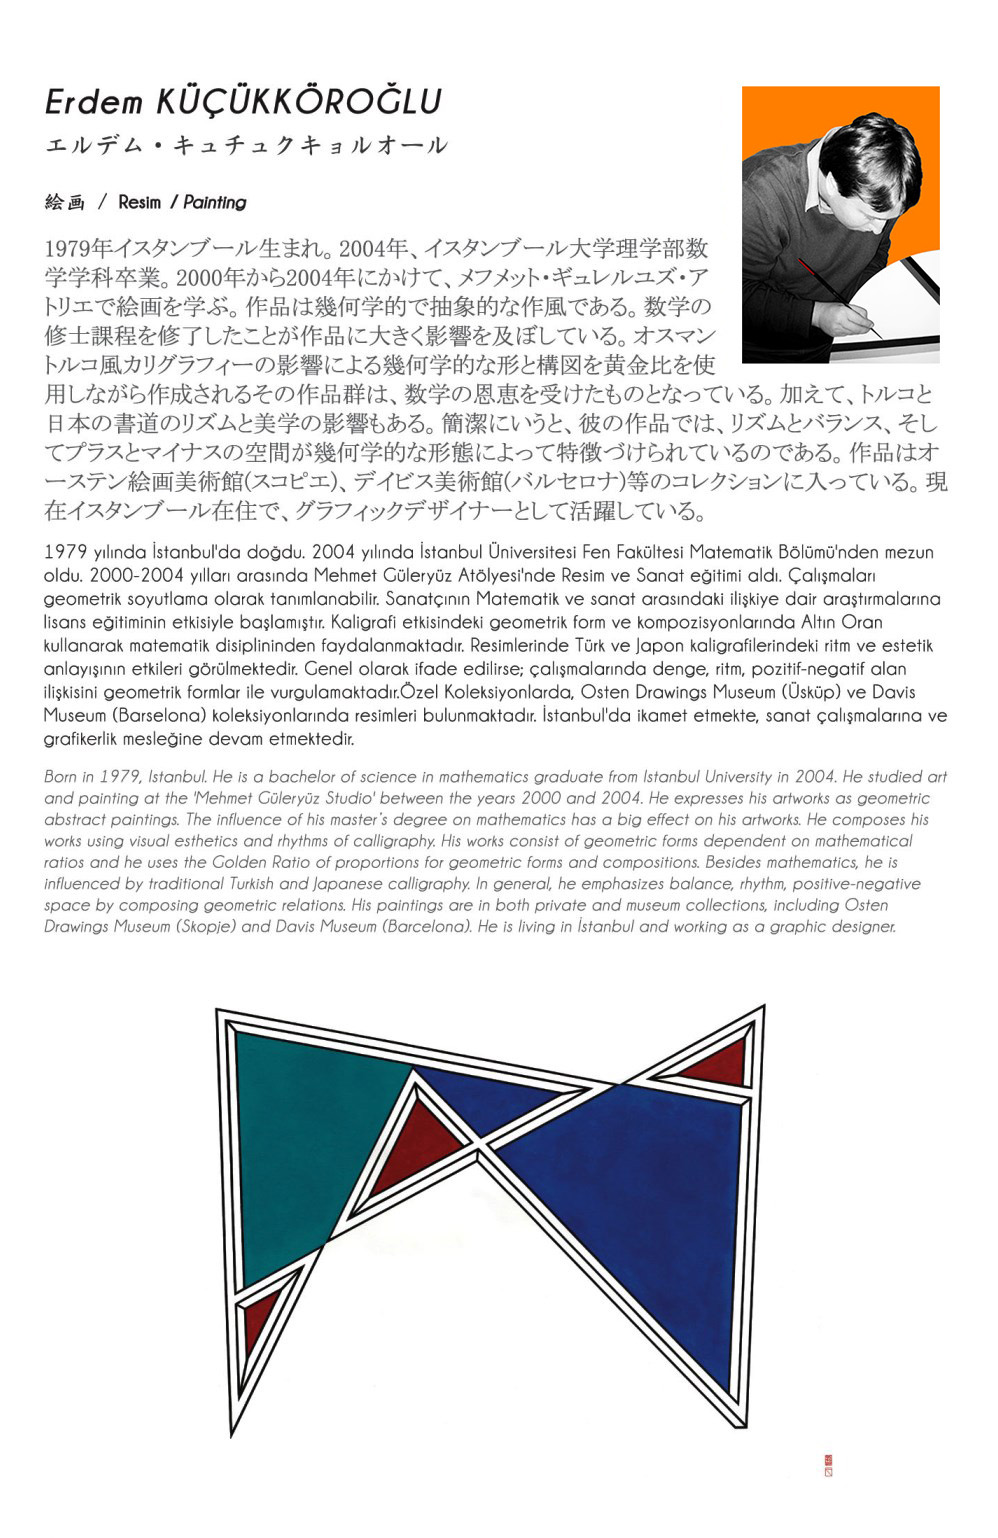 45_artturkey_japan_erdem_kucukkoroglu